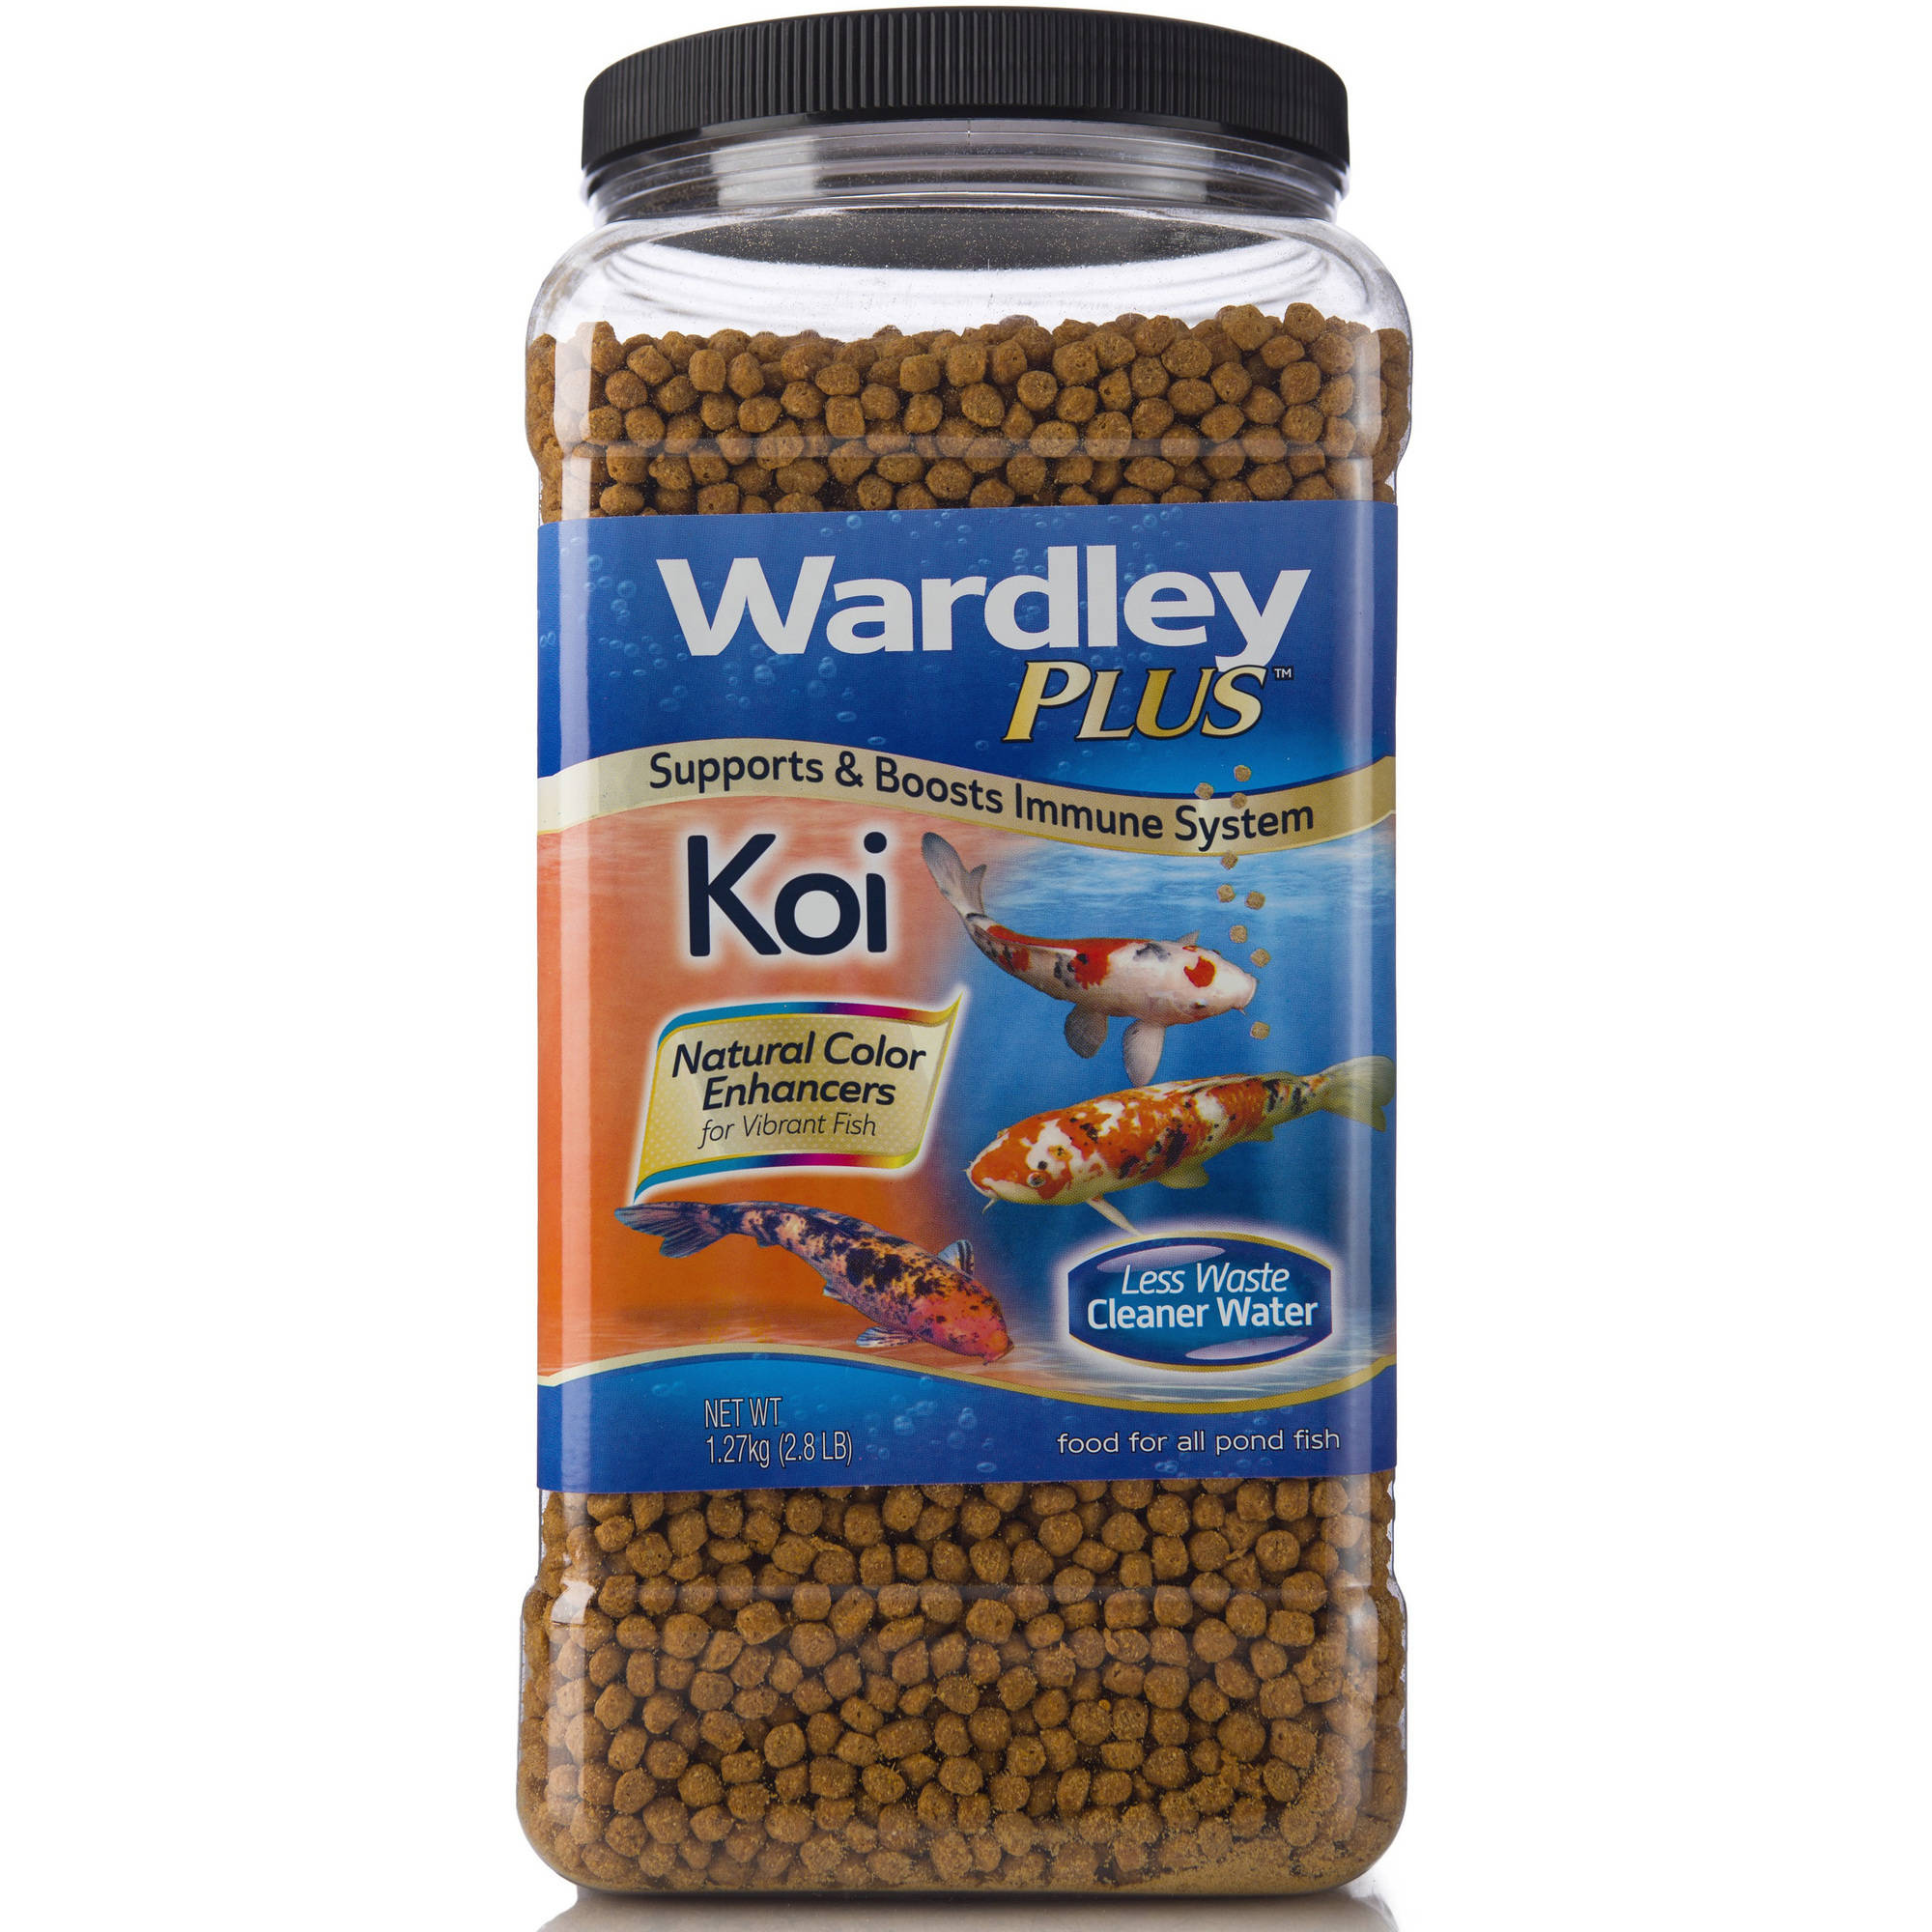 Wardley Premium Koi Fish Food, 2.8lbs